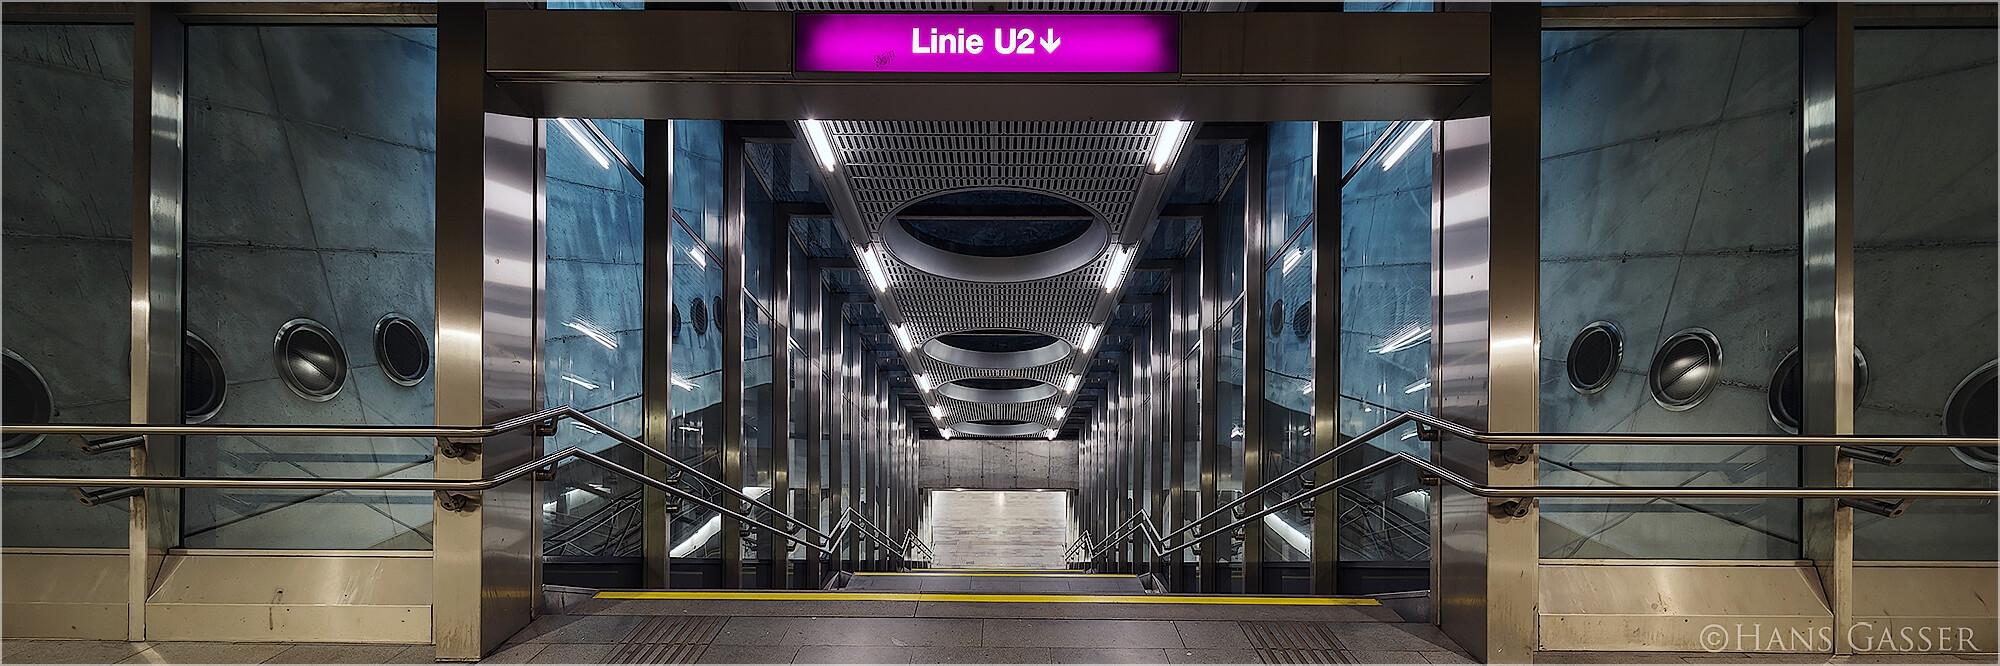 Panoramabild U-Bahn Sation Praterstern Wien